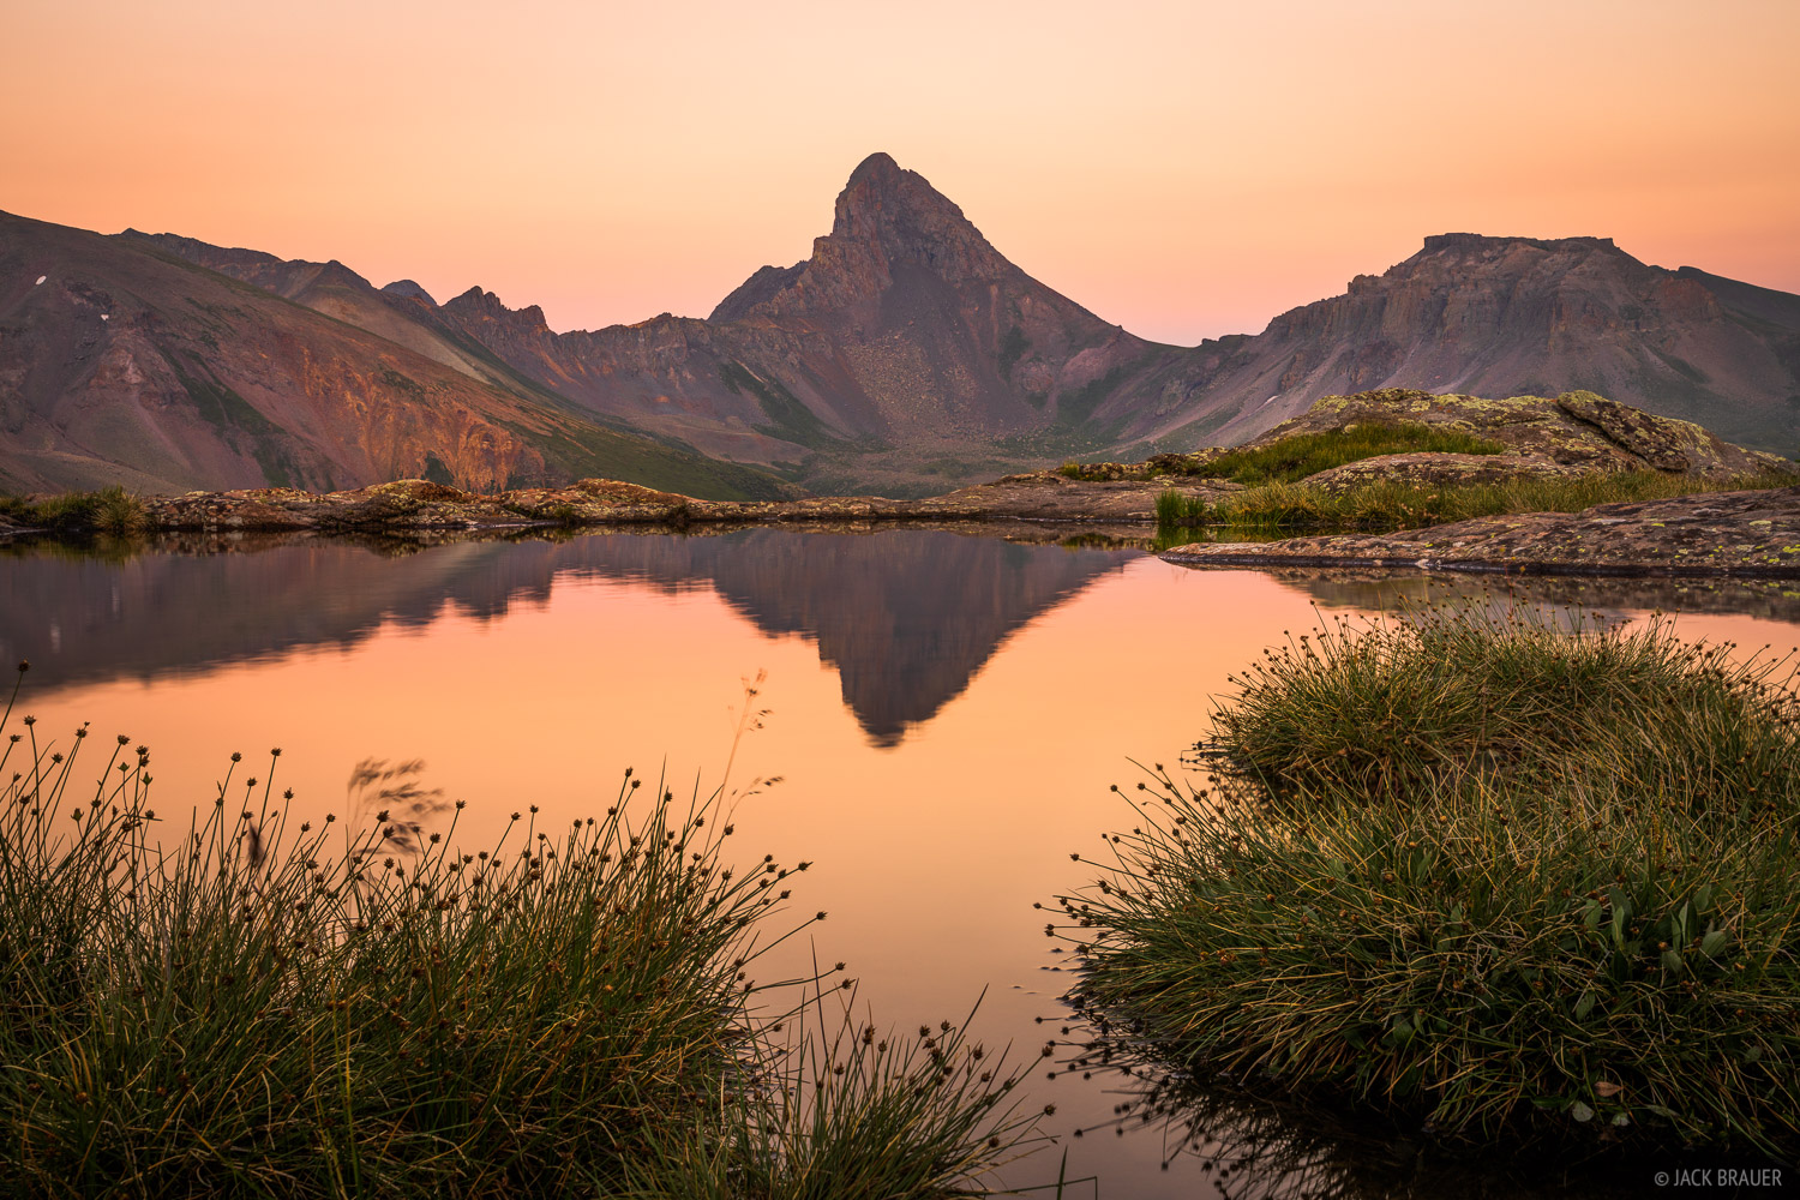 Sunset light illuminates a hazy sky above Wetterhorn Peak (14,015 ft.) in the San Juan Mountains of southwest Colorado.